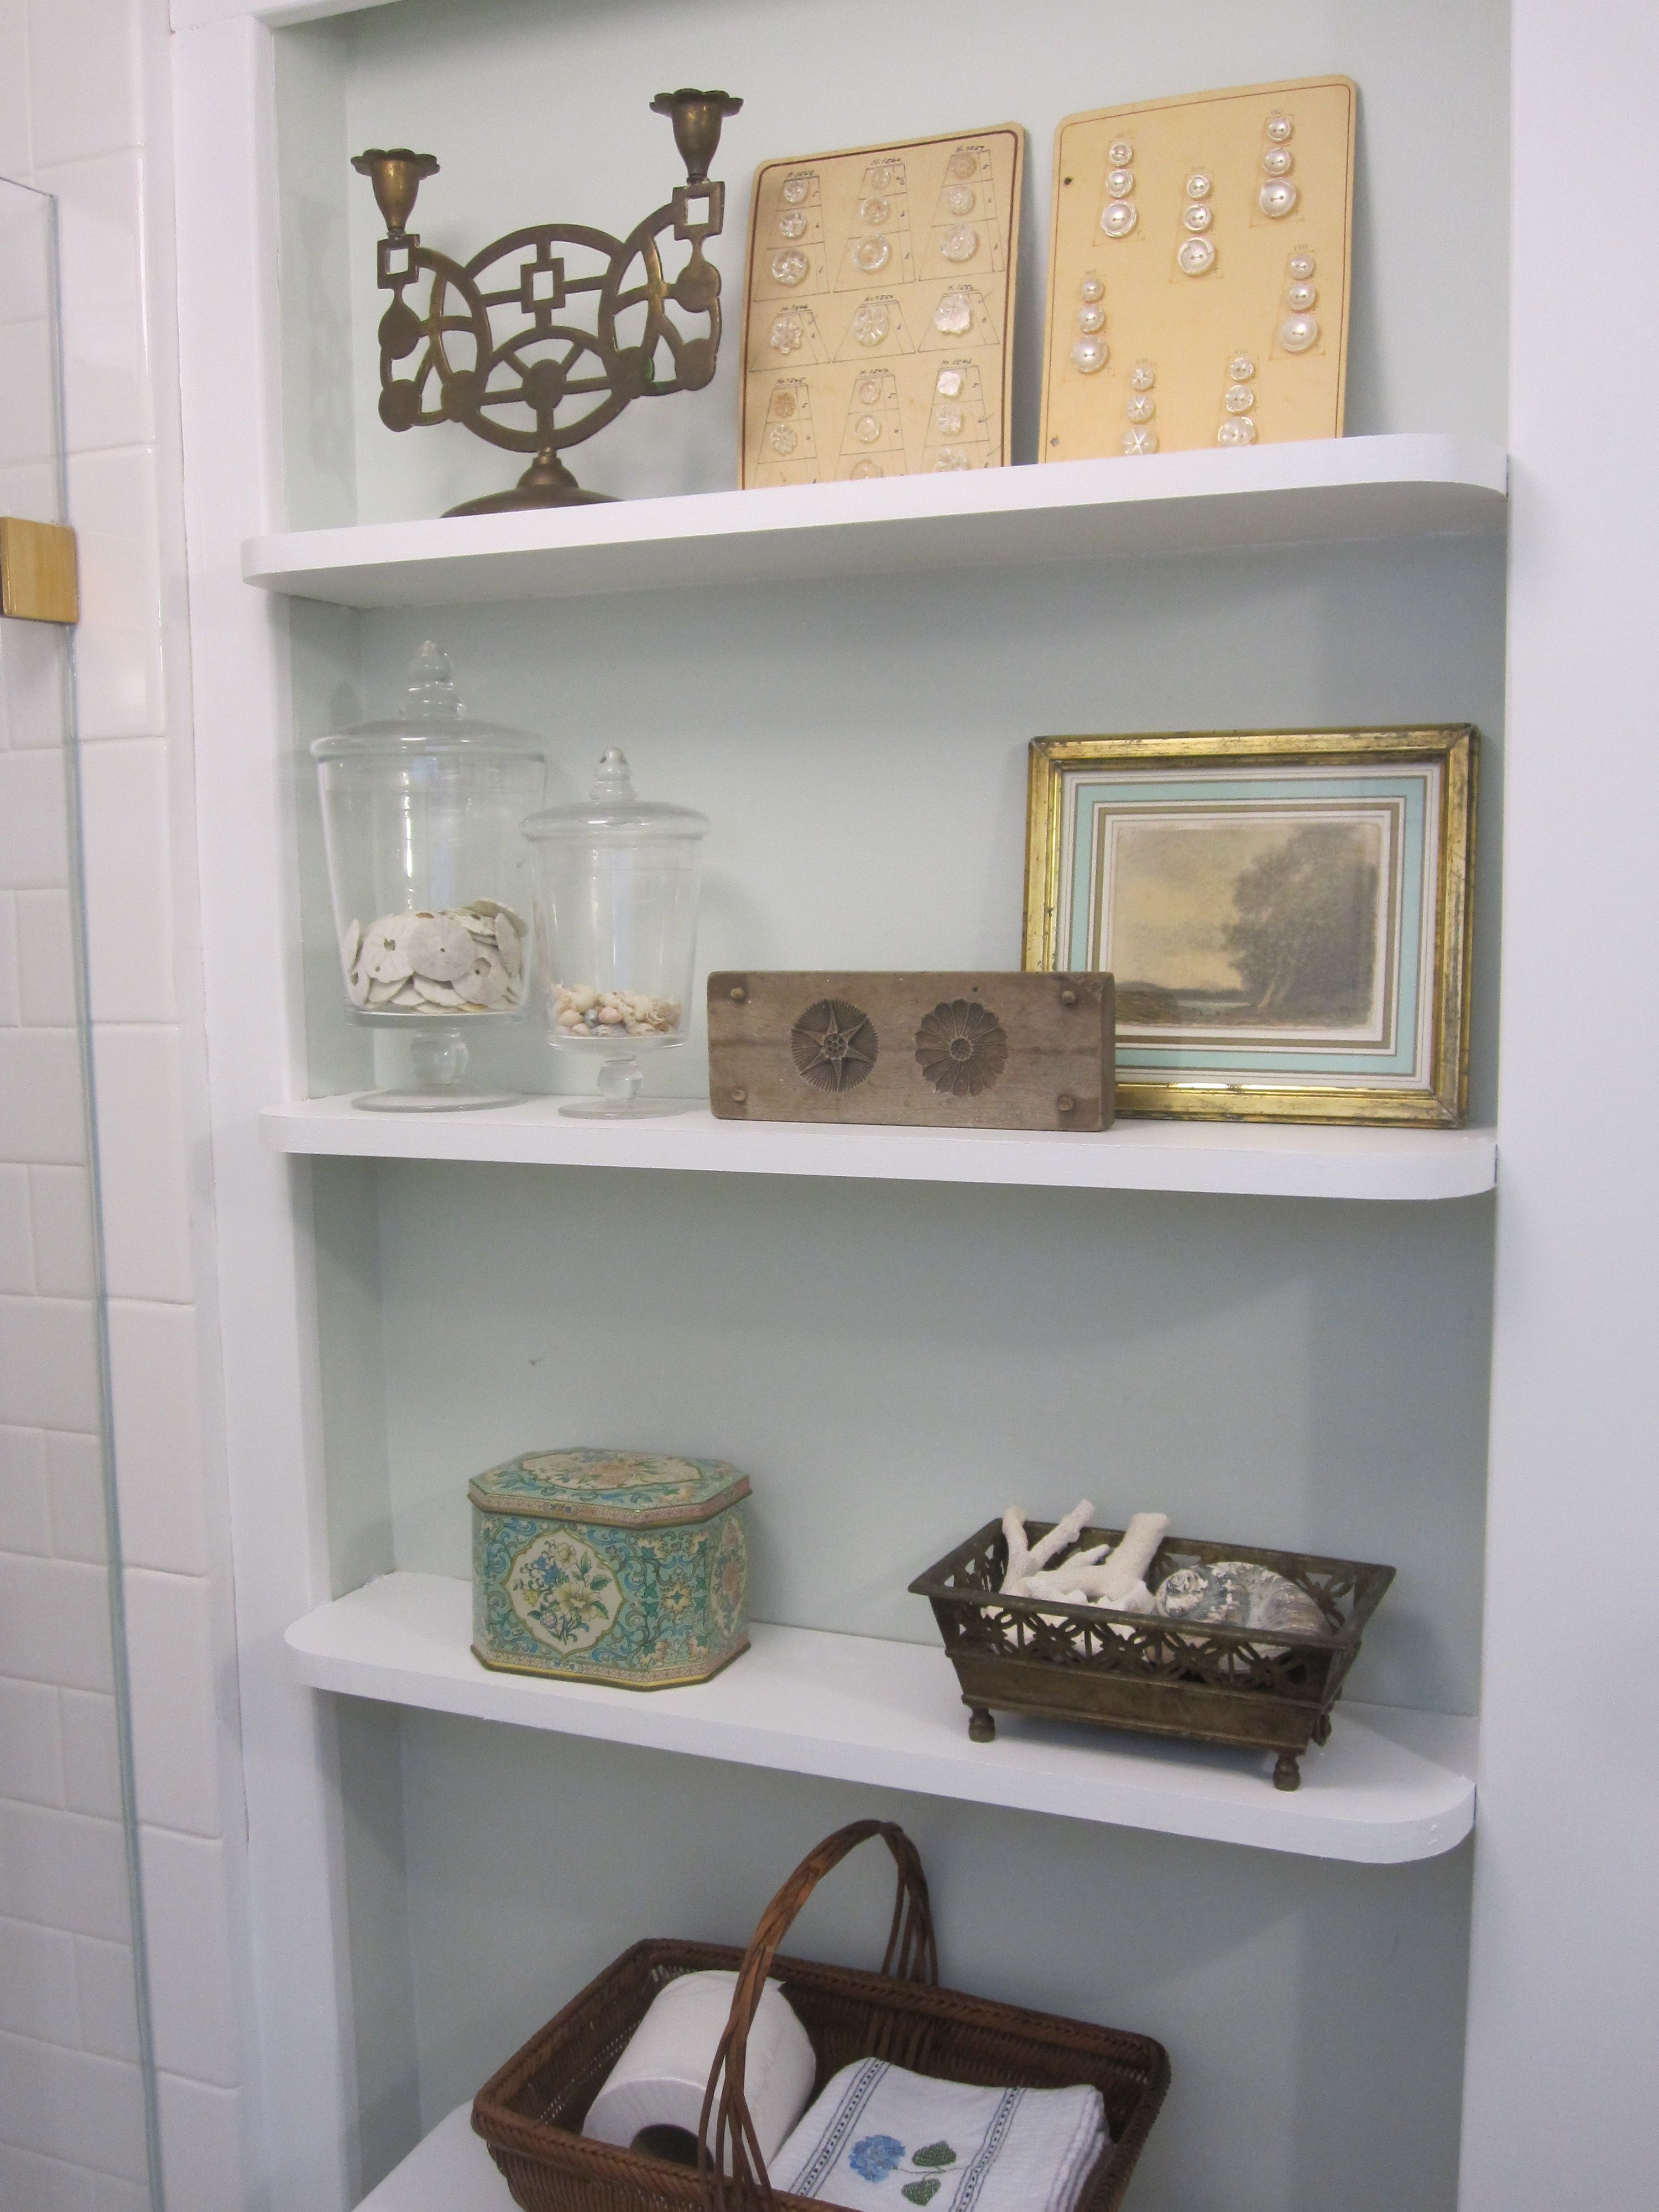 White Recessed Bathroom Shelves For Small Bathroom Storage